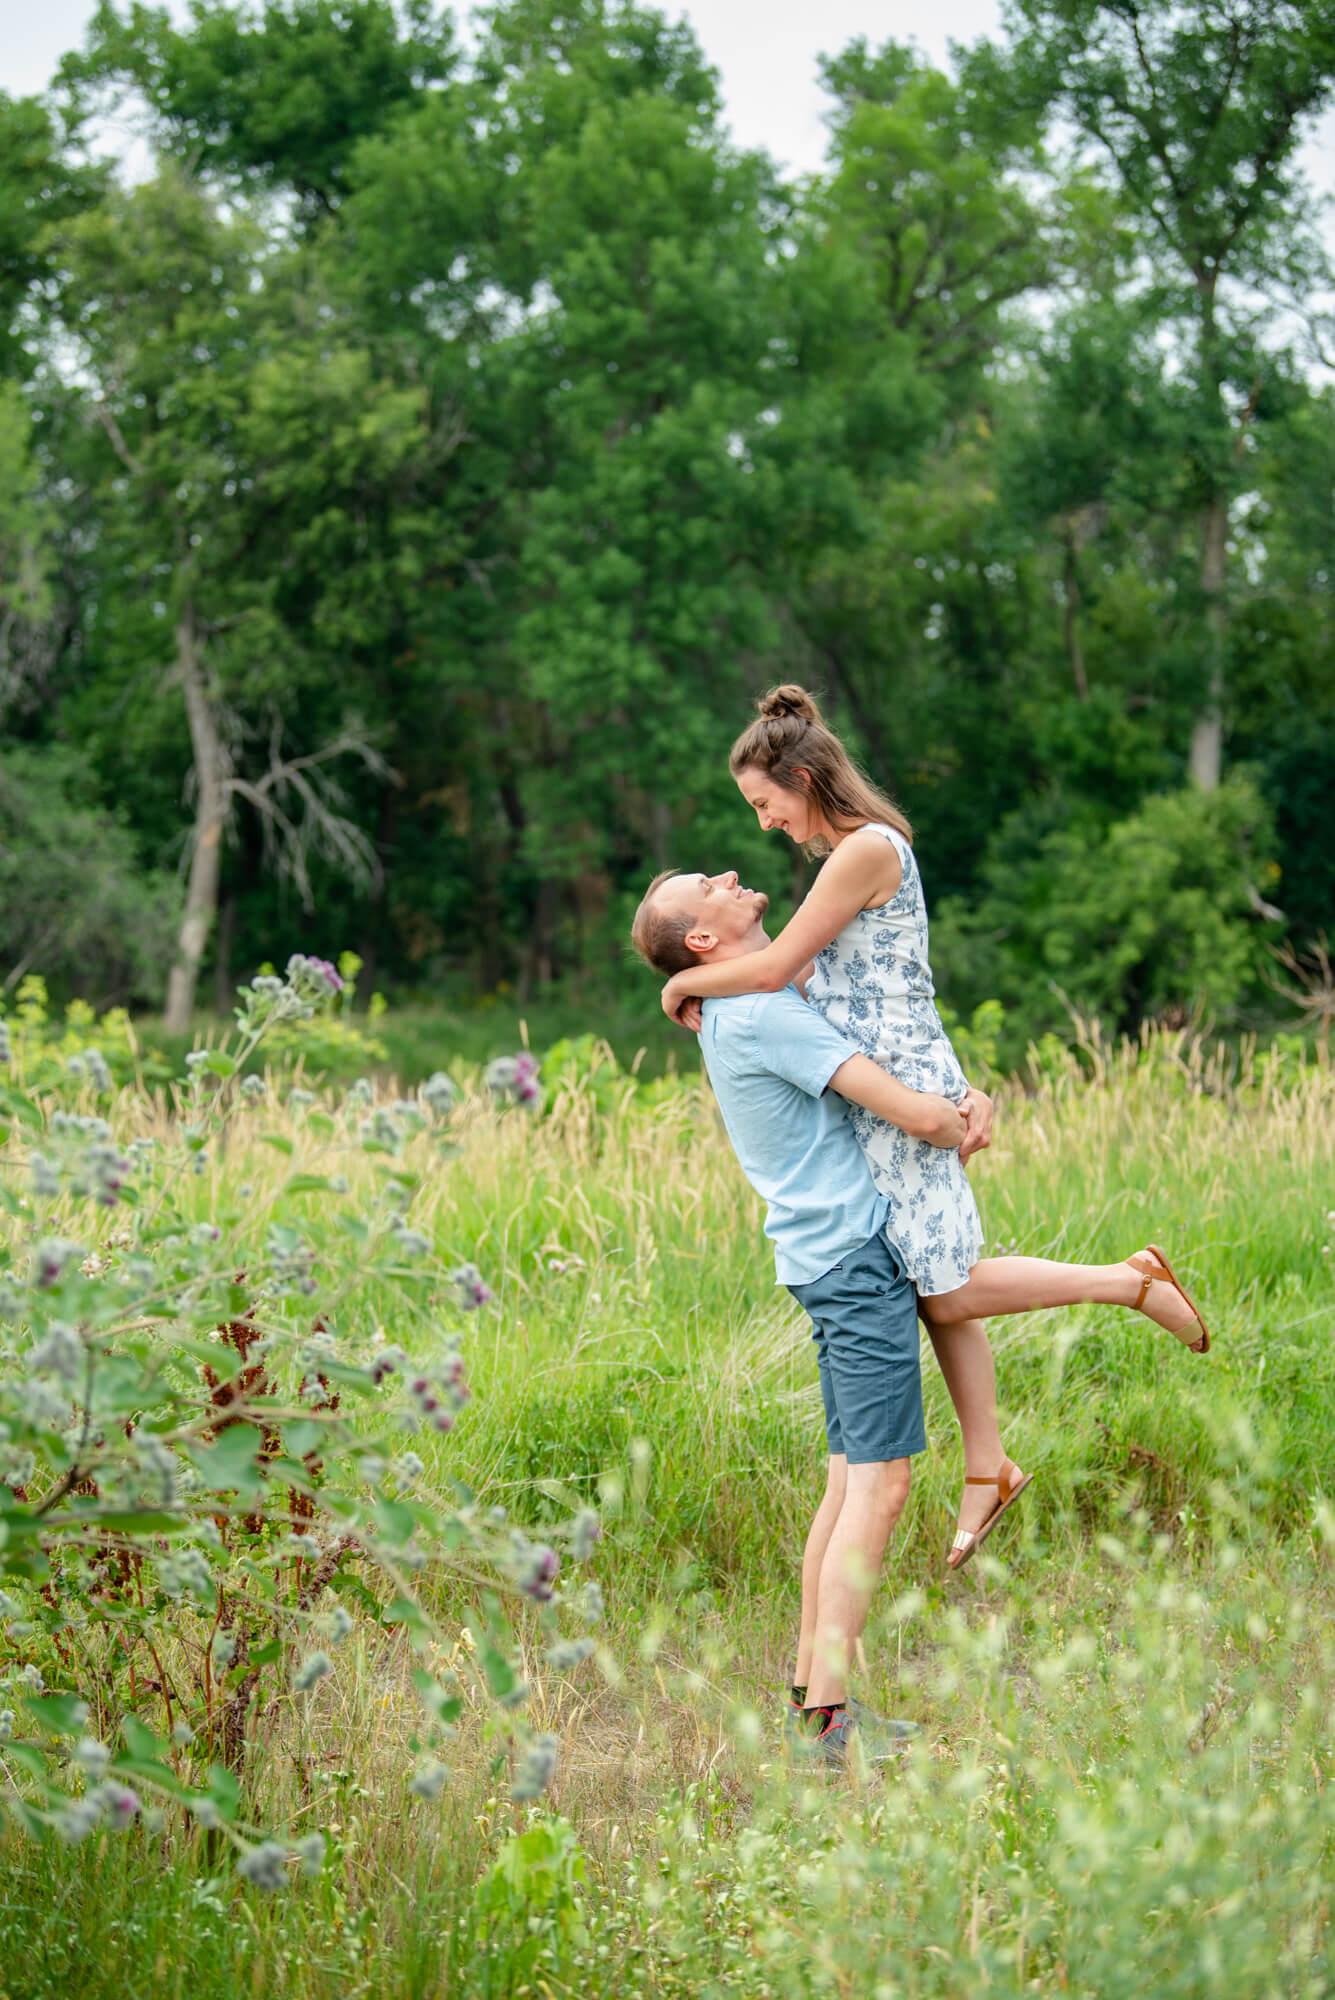 DSC 4745 - John and Faith's Engagement   Fargo, North Dakota